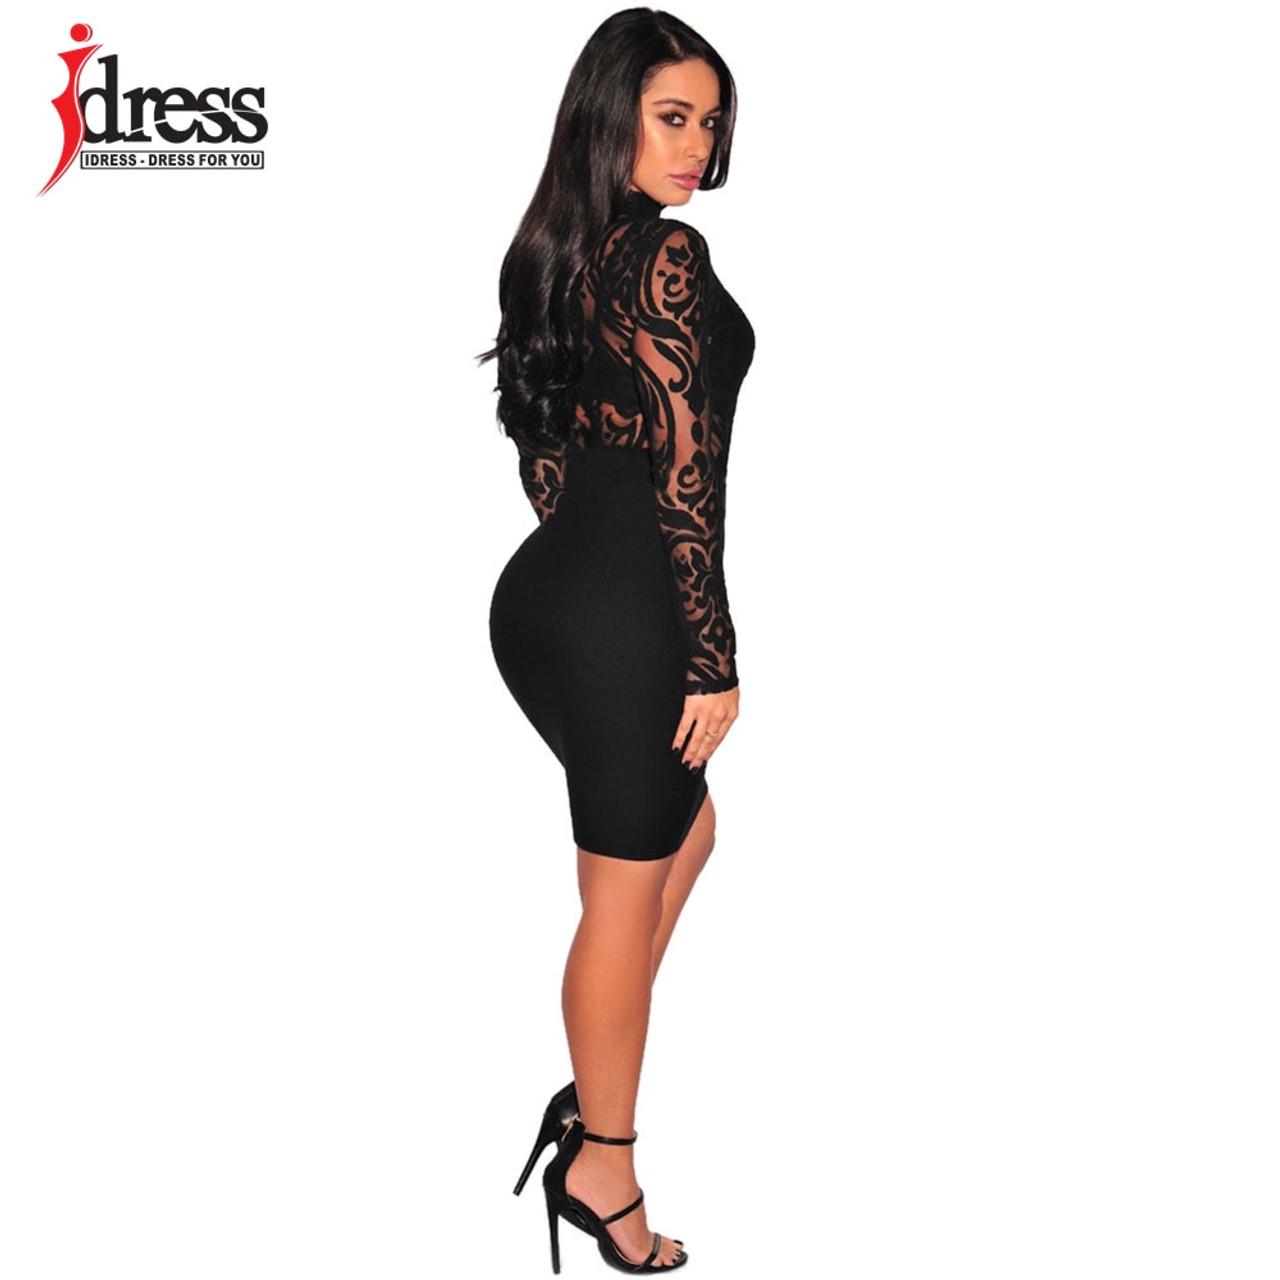 ... IDress Hot Bodies See Through Sexy Bodysuit Women Rompers Bodycon  Jumpsuit Transparent Bodysuits Women Long Sleeve ... 2929679d0